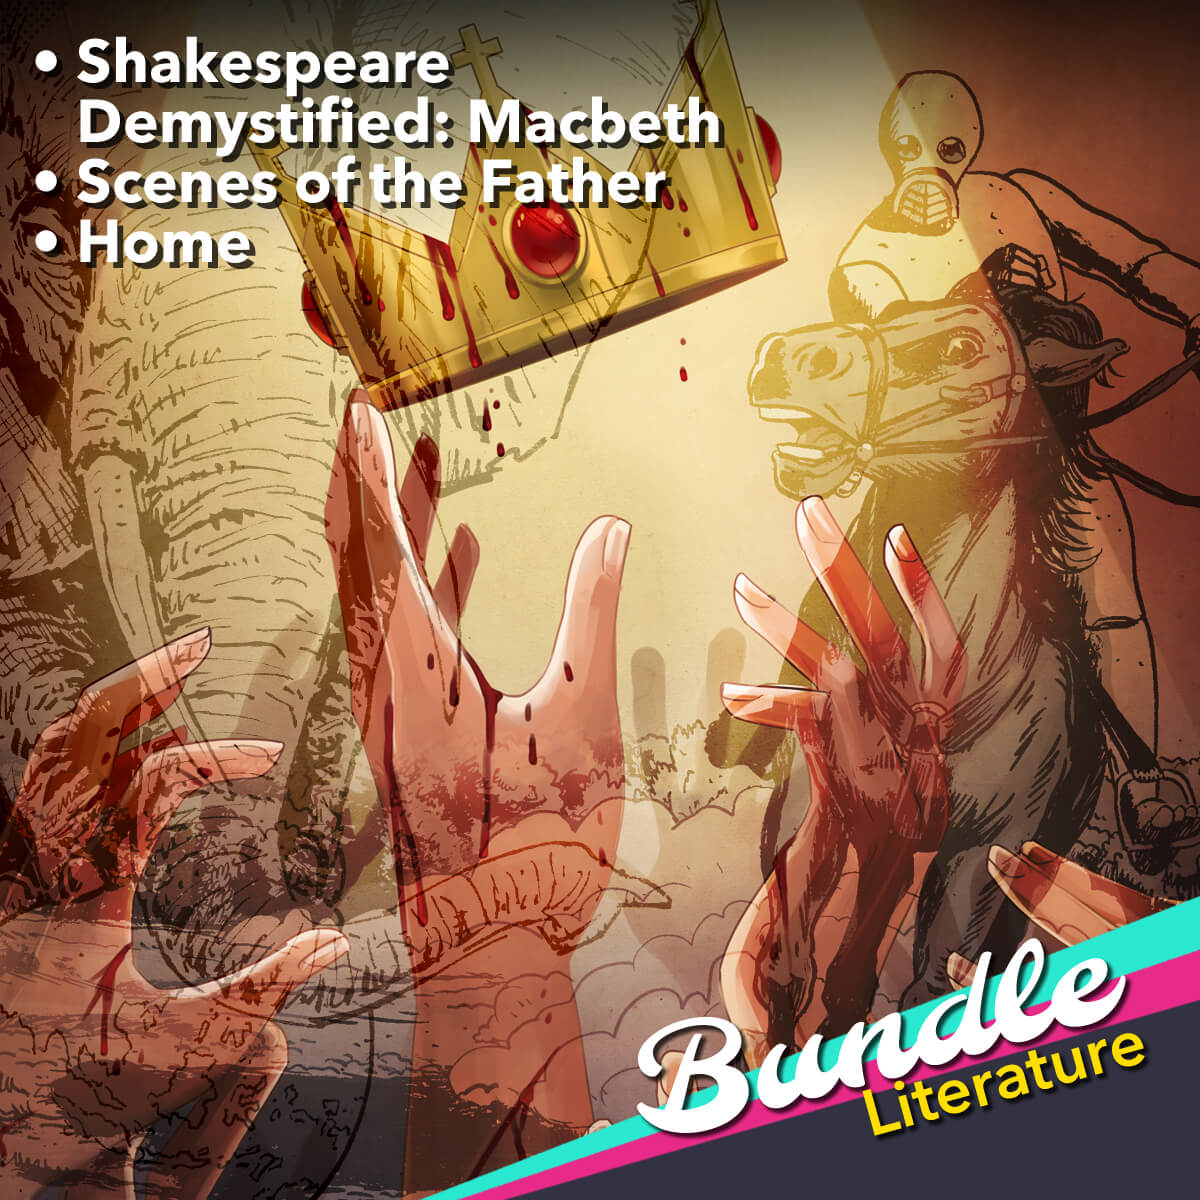 bundle-literature-1547995901.jpg